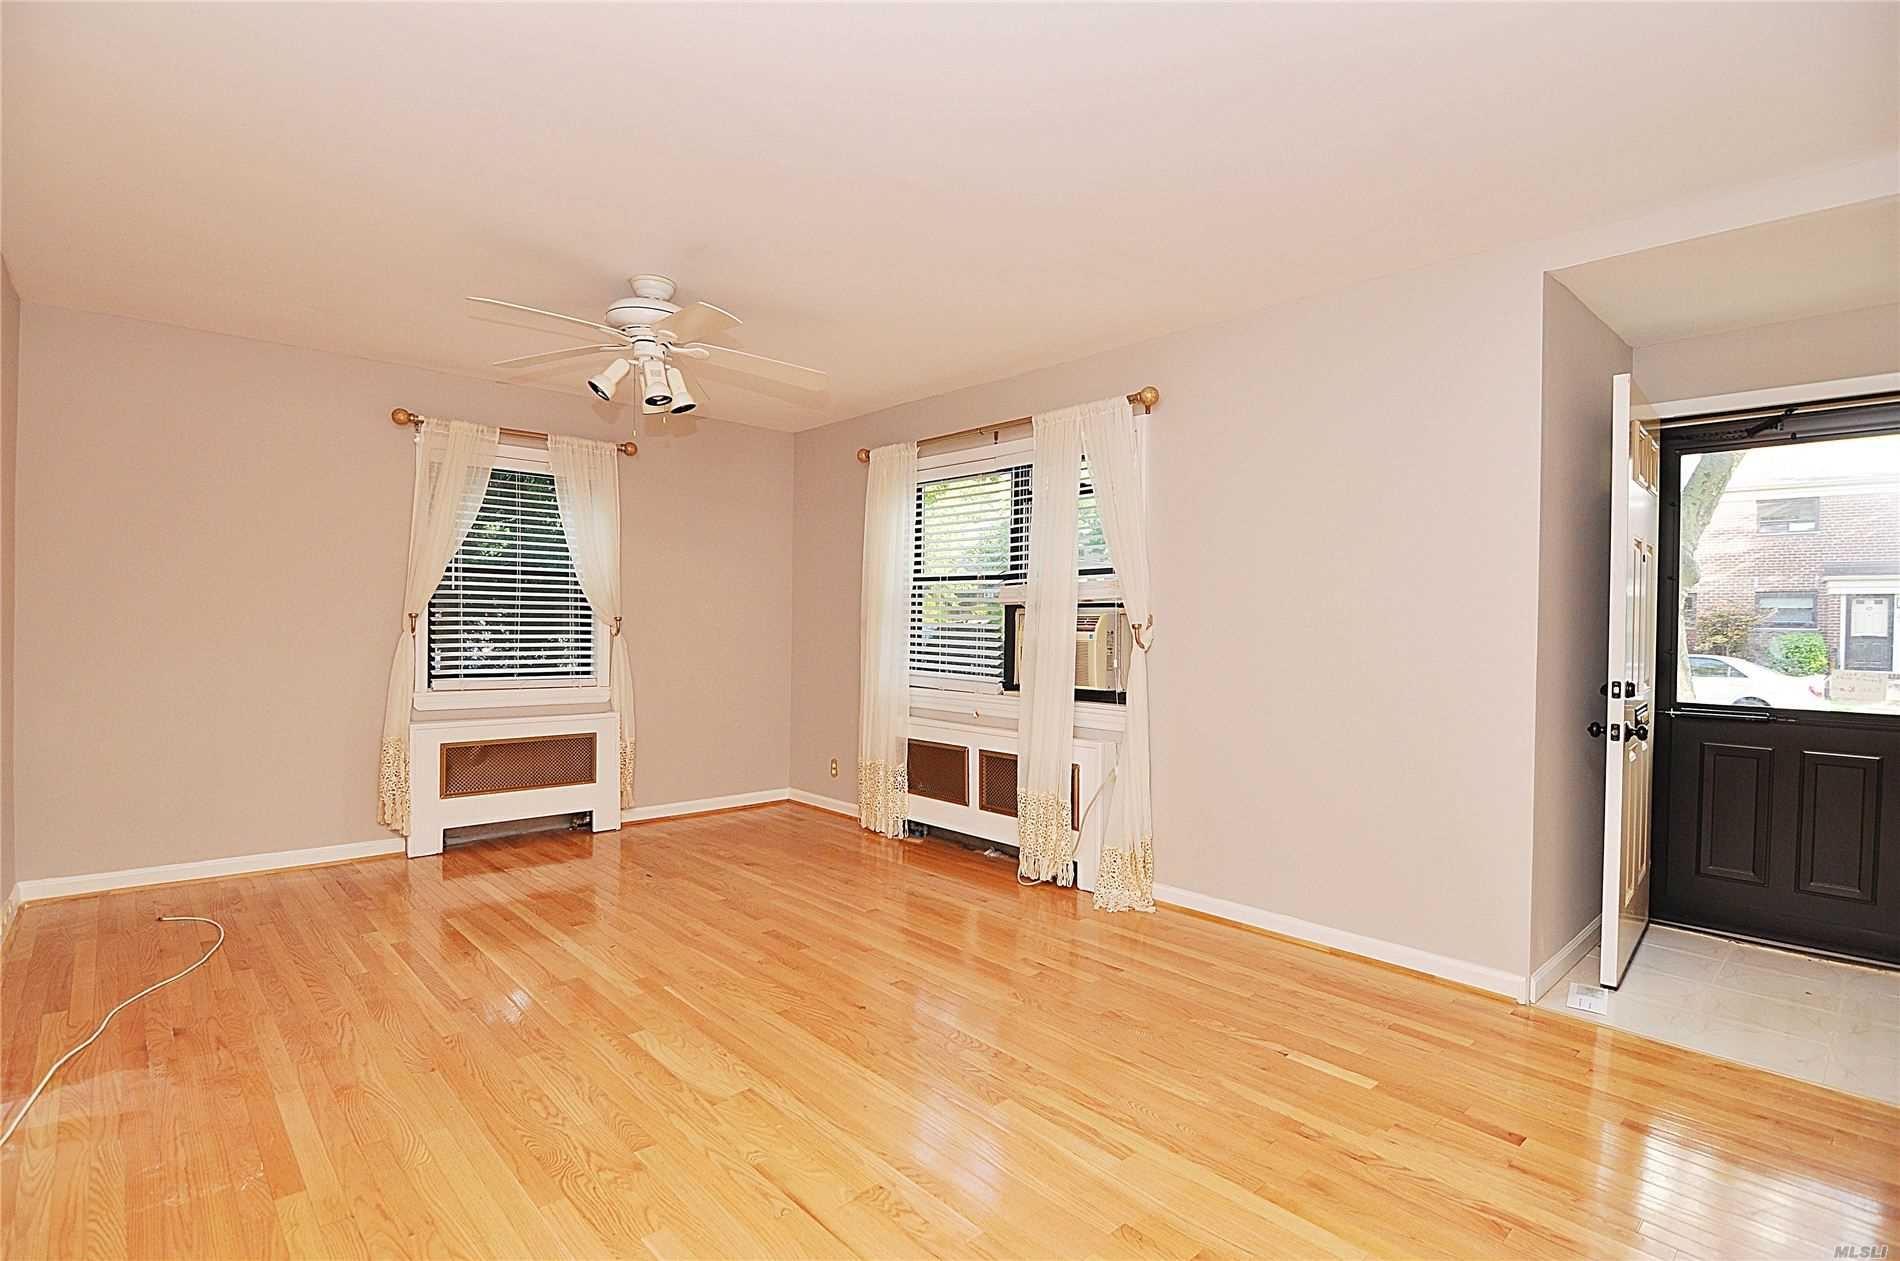 219-51 75th Avenue #Lower, Bayside, NY 11364 - MLS#: 3234222